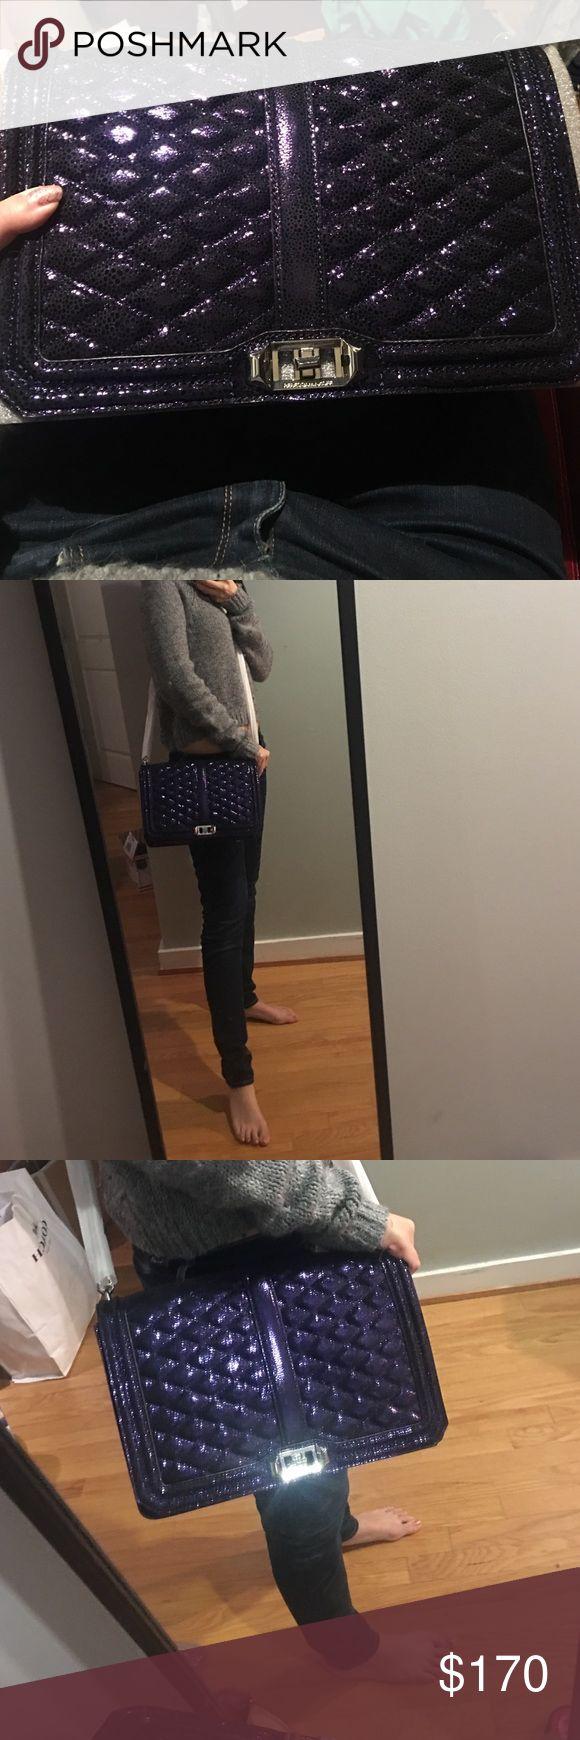 Rebecca minkoff love large crossbody Purple skin skin patterned. Good deal from sample sale Rebecca Minkoff Bags Crossbody Bags